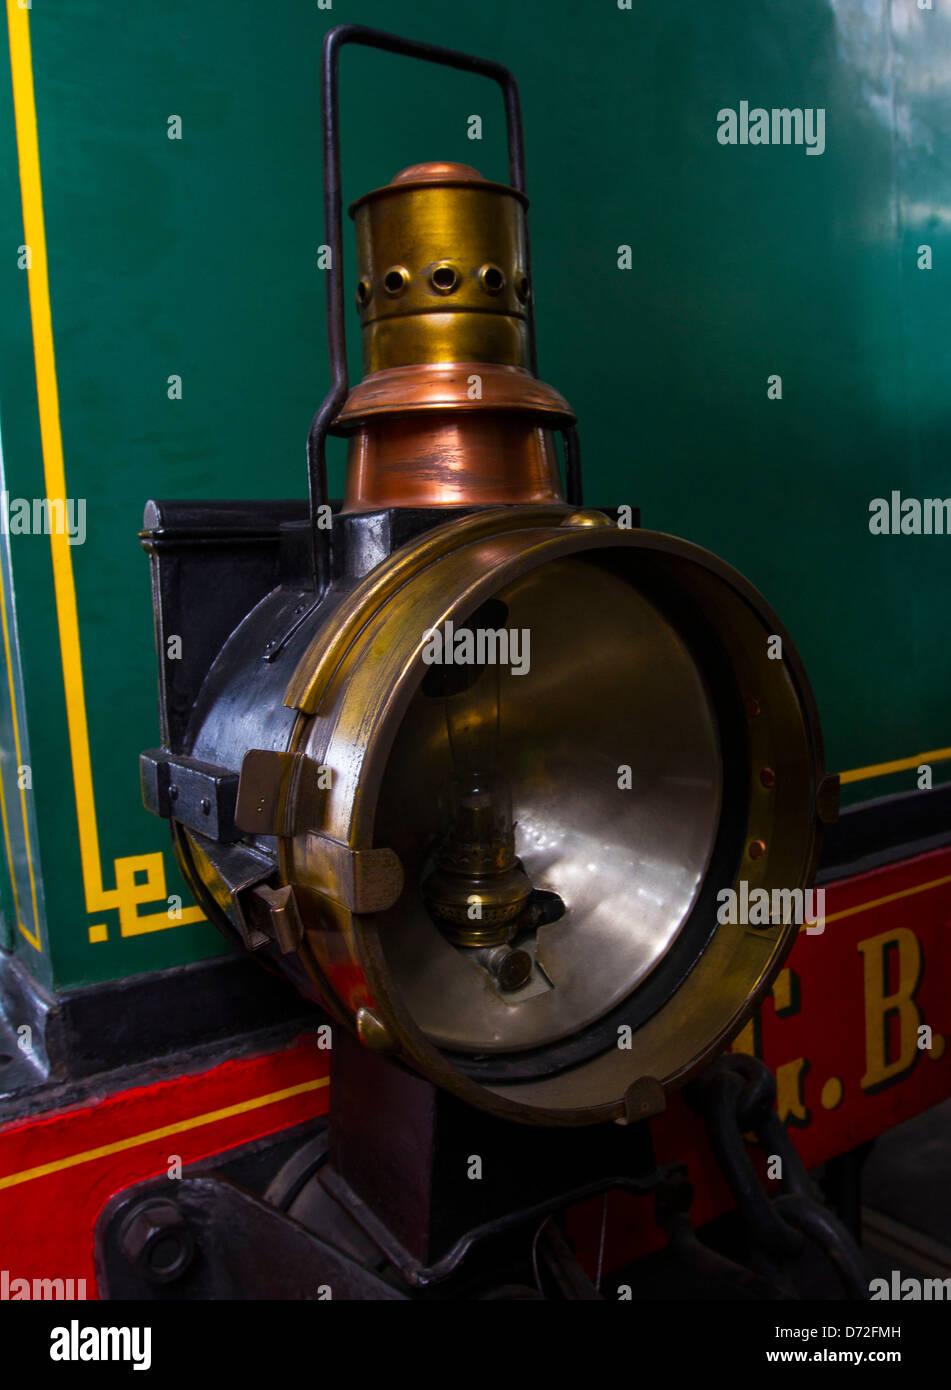 Antique train headlamp. - Stock Image